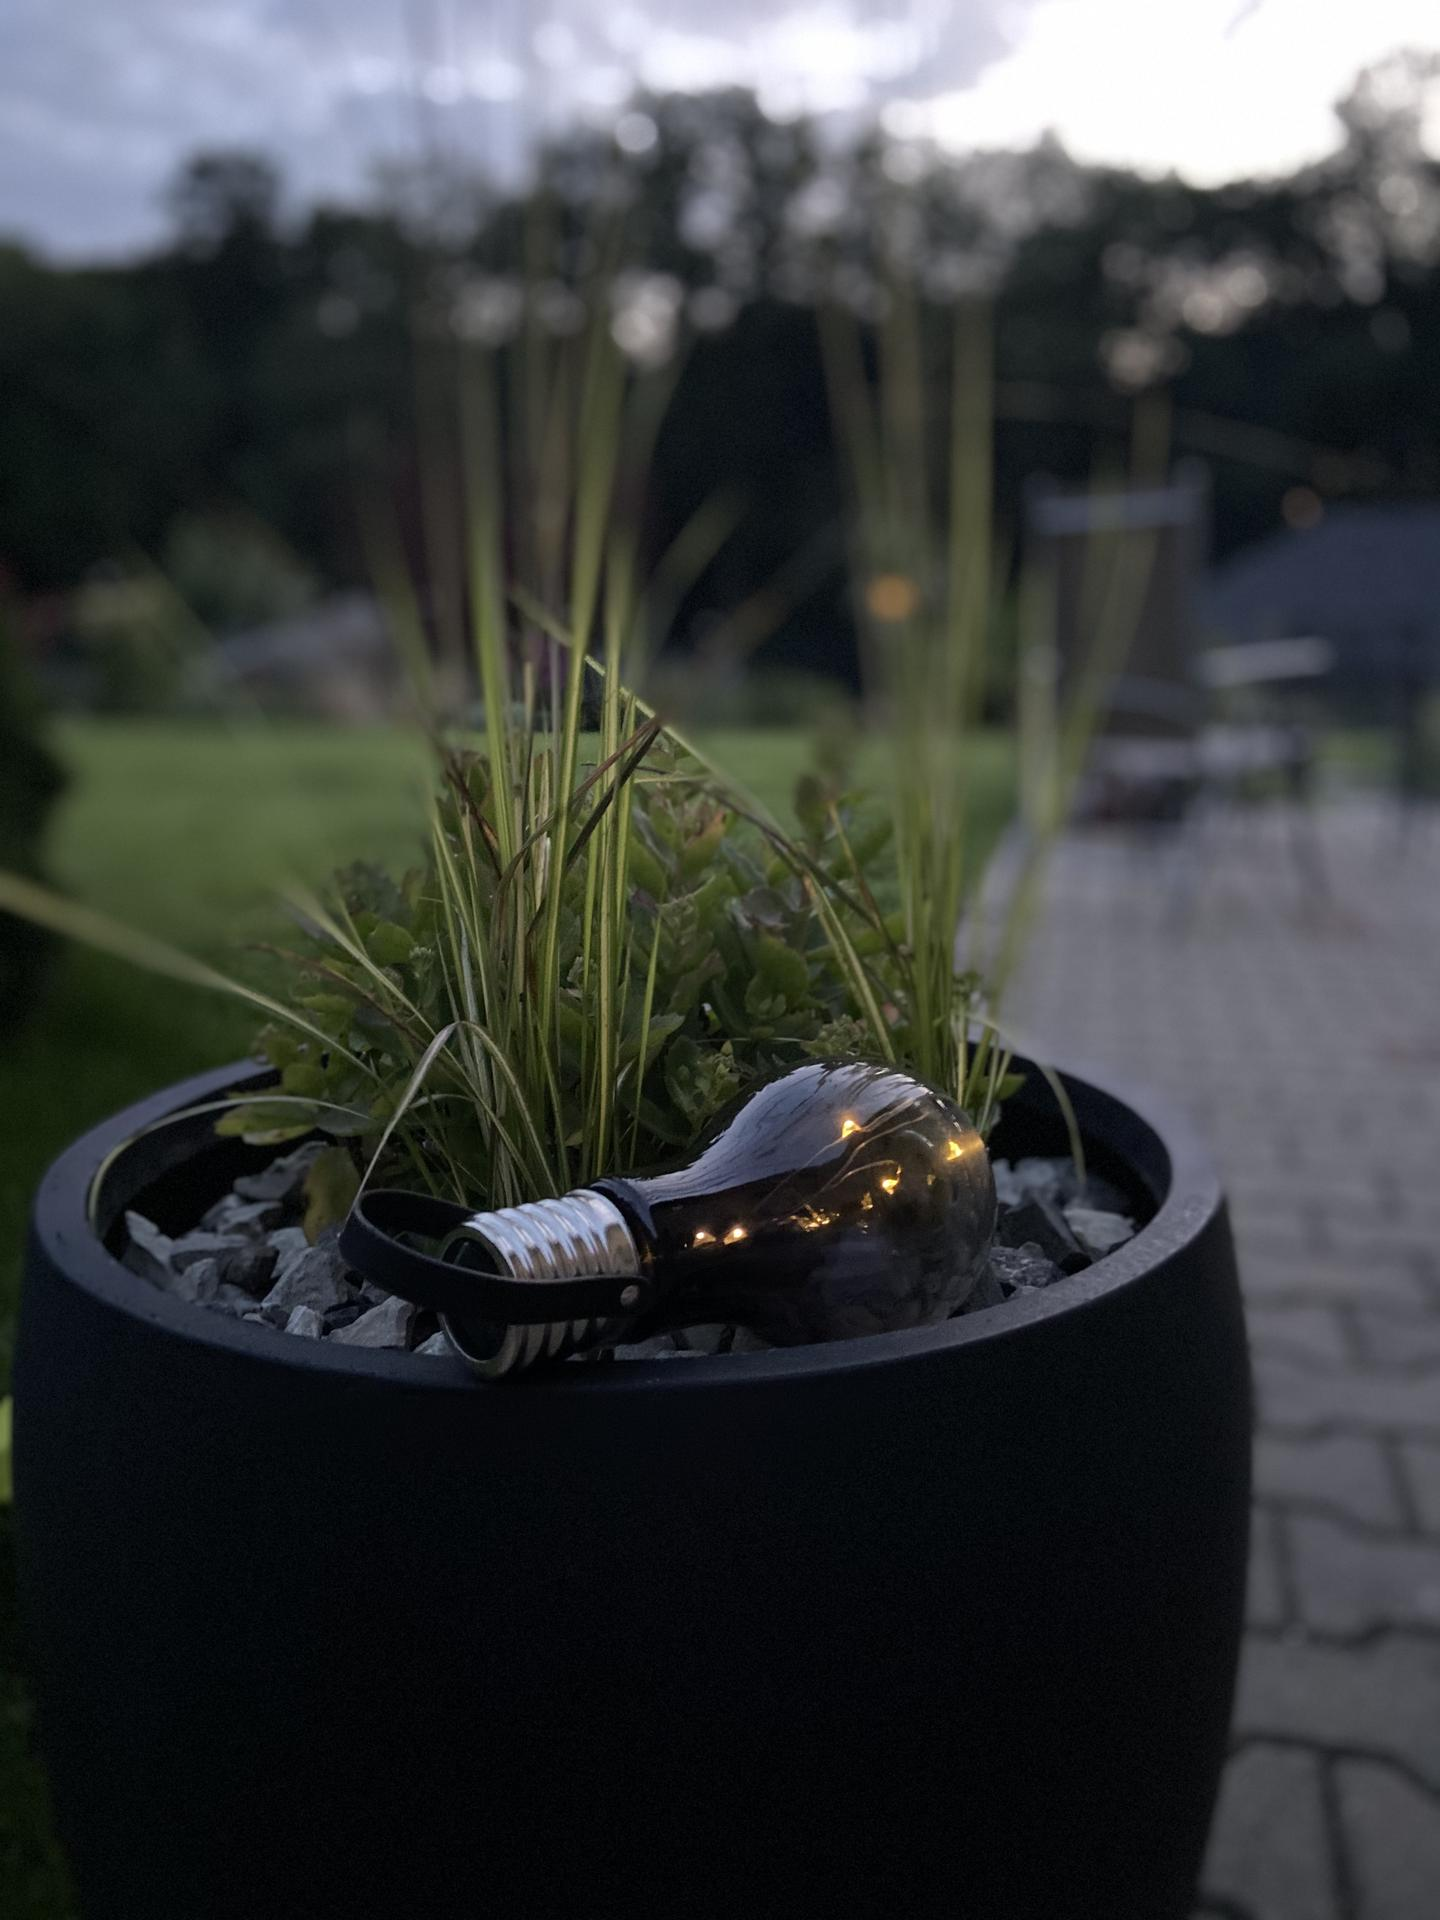 Pergola + zimní zahrada + zahrada - moje nové lampičky